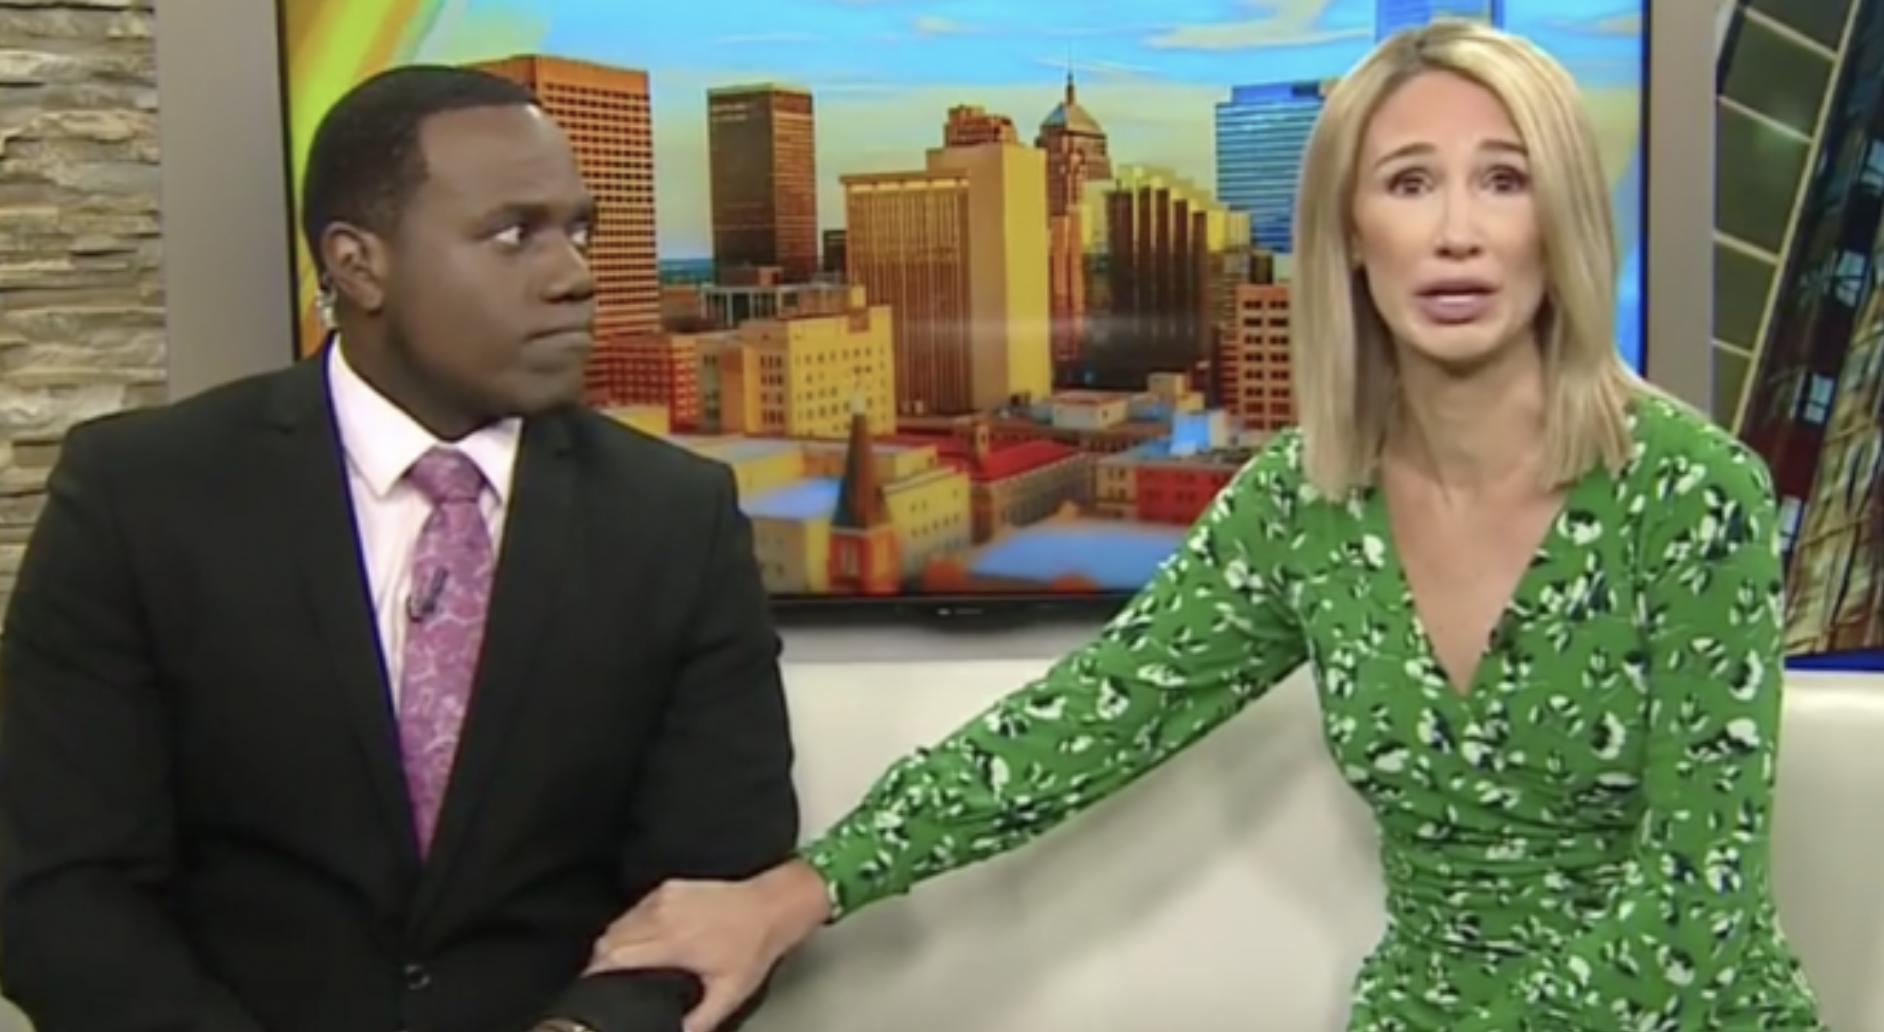 Morning News Anchor Compares Black Co-Host to Gorilla